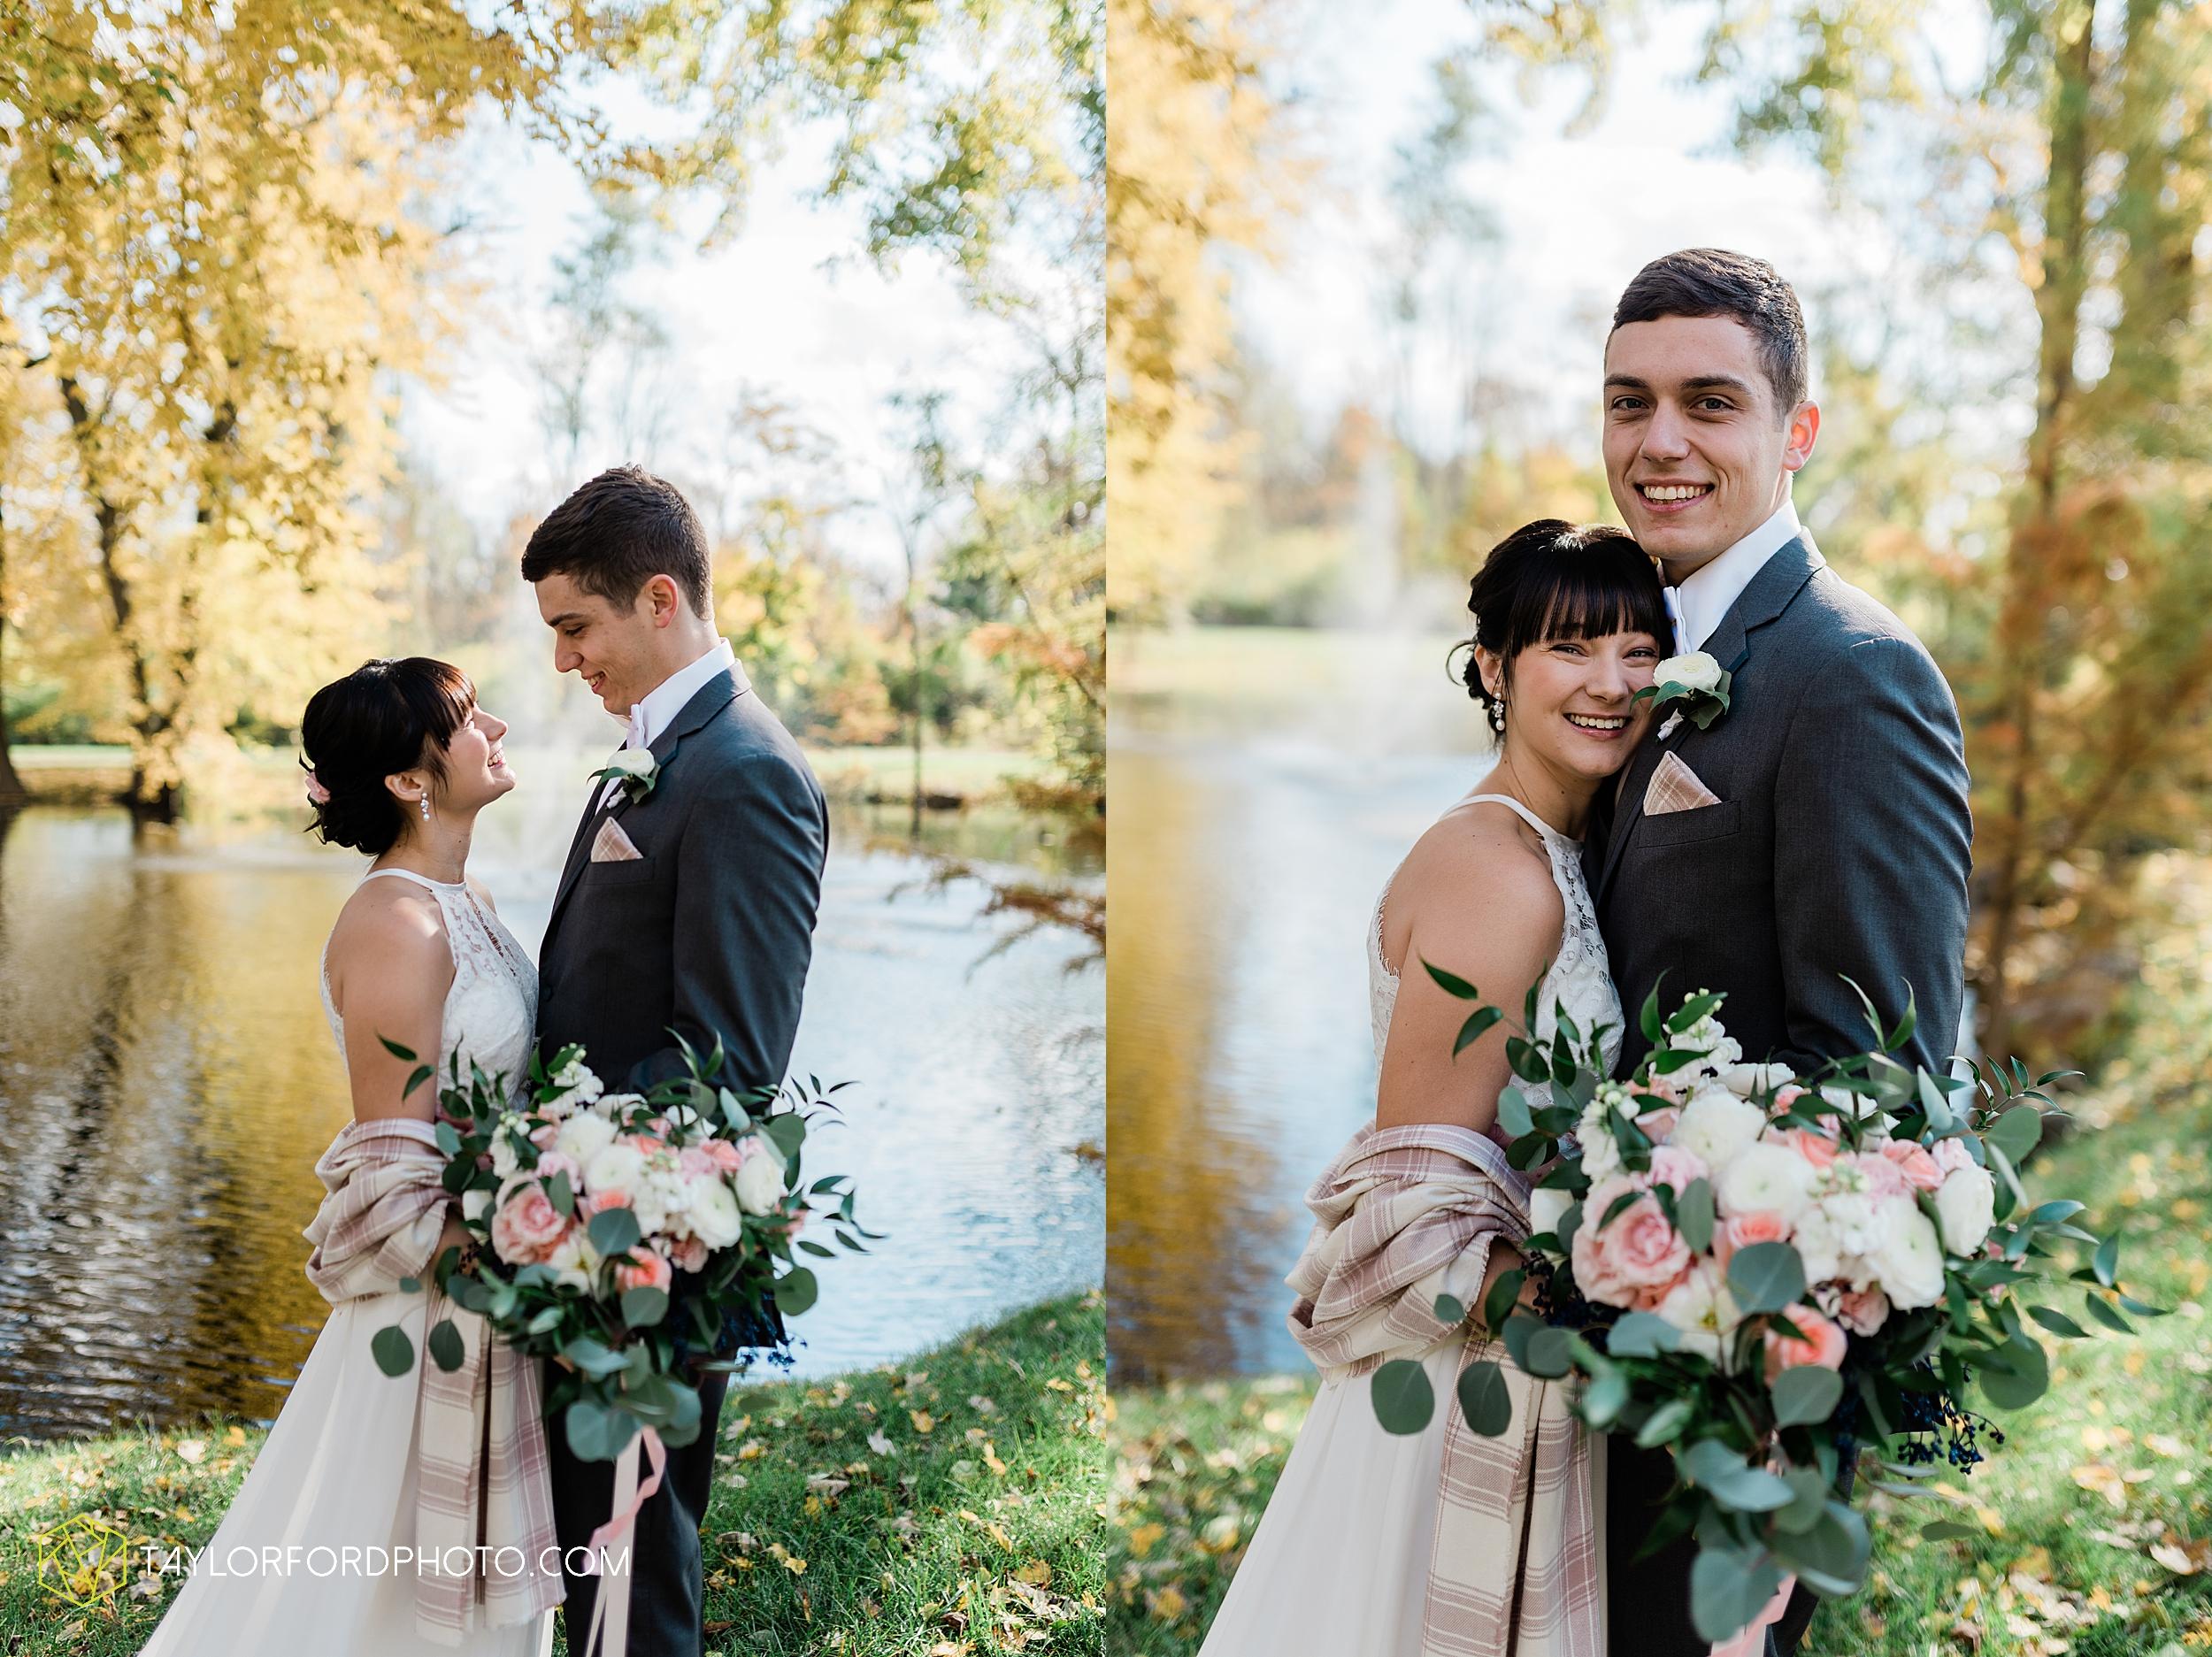 marissa-nicole-nick-daeger-orrmont-estate-farm-wedding-piqua-dayton-troy-ohio-fall-photographer-taylor-ford-photography_1508.jpg